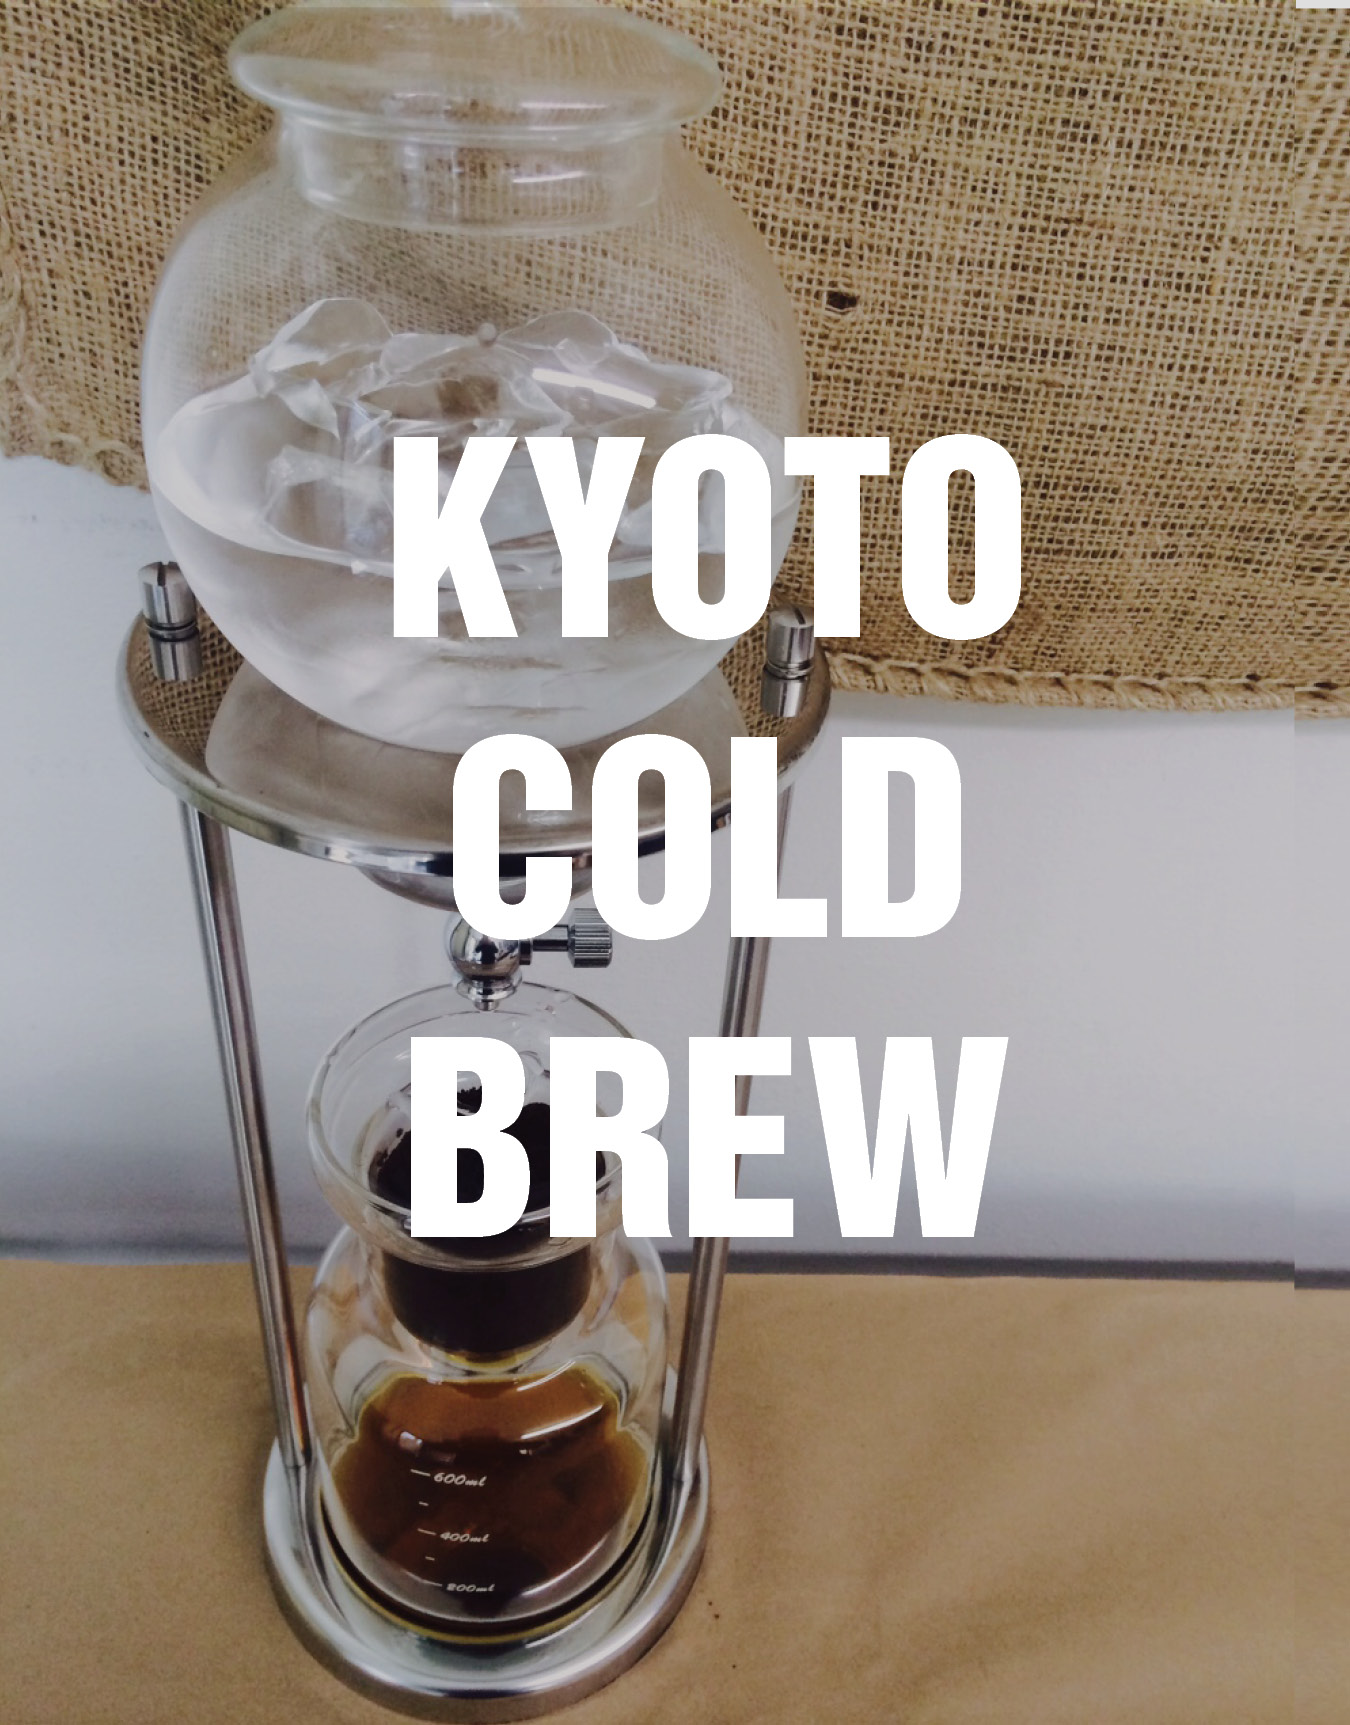 KyotoColdBrew.jpg